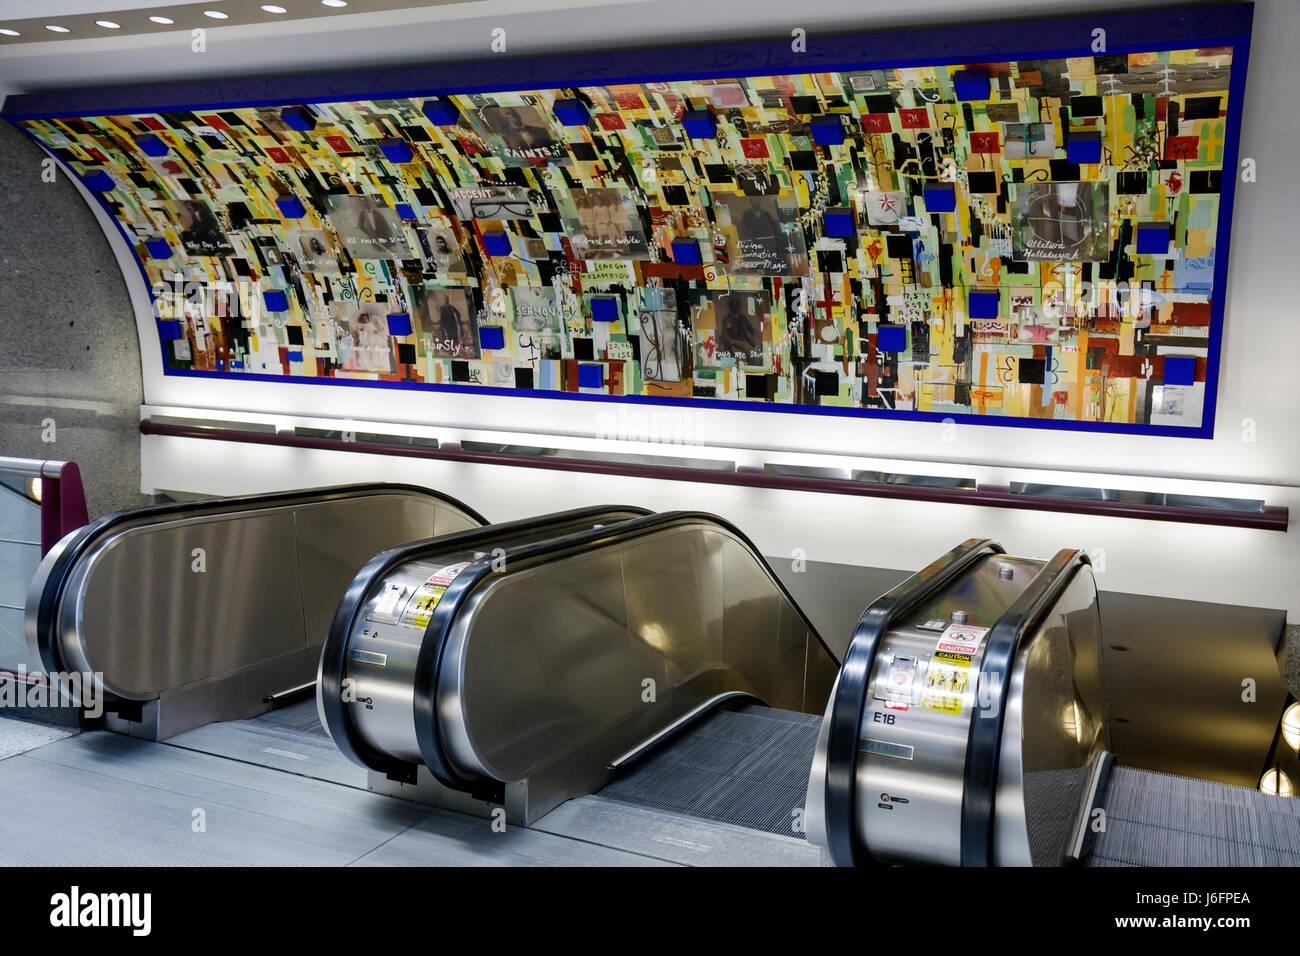 Atlanta Georgia Hartsfield-Jackson Atlanta International Airport escalator up down mural public art Saints Radcliffe - Stock Image